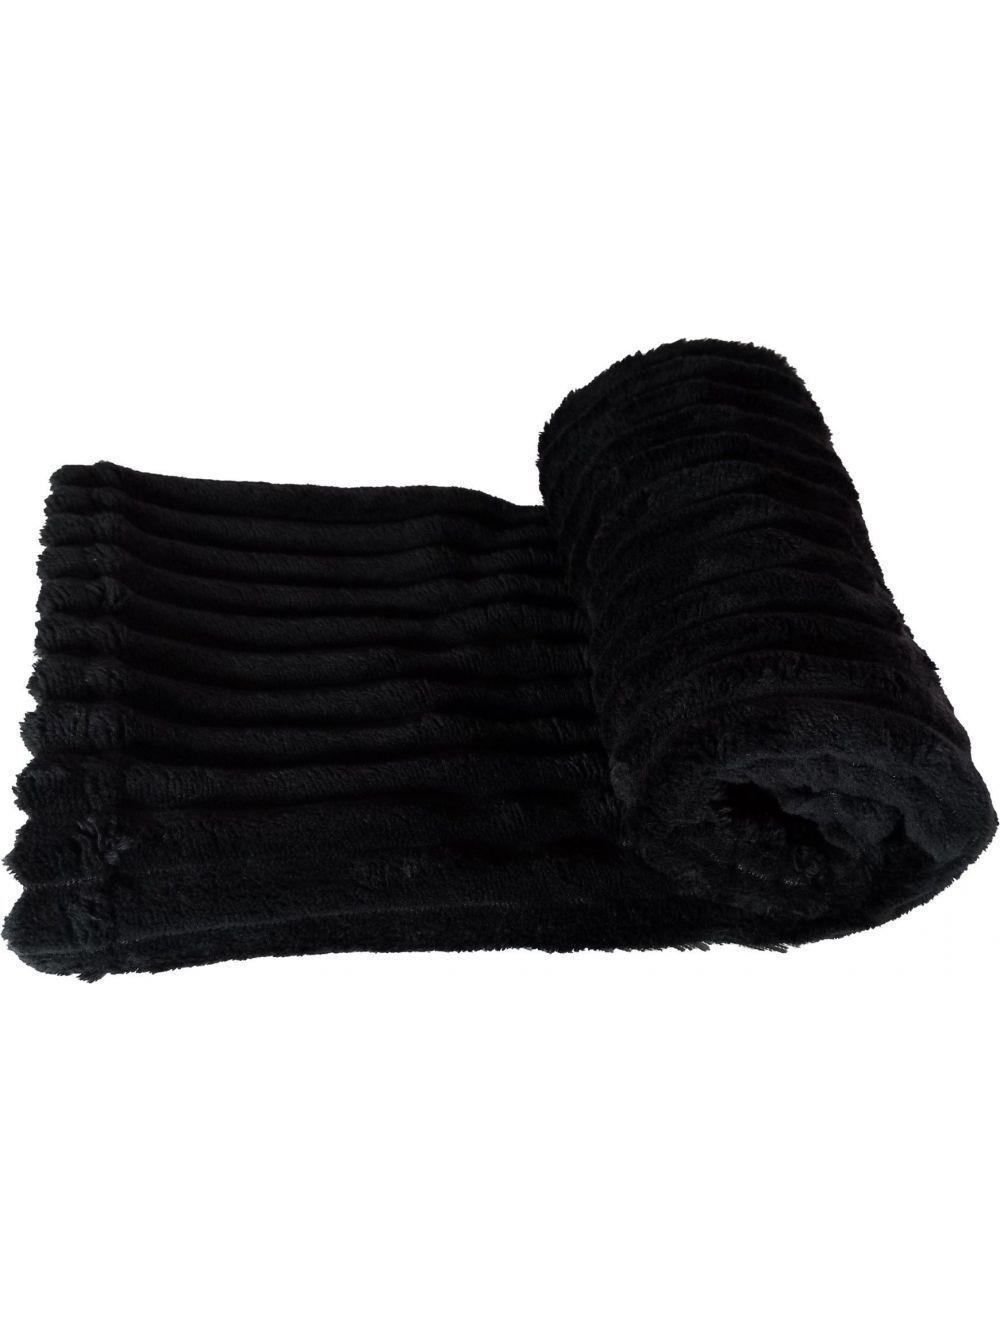 Cobija Relief para Mascotas Negro S